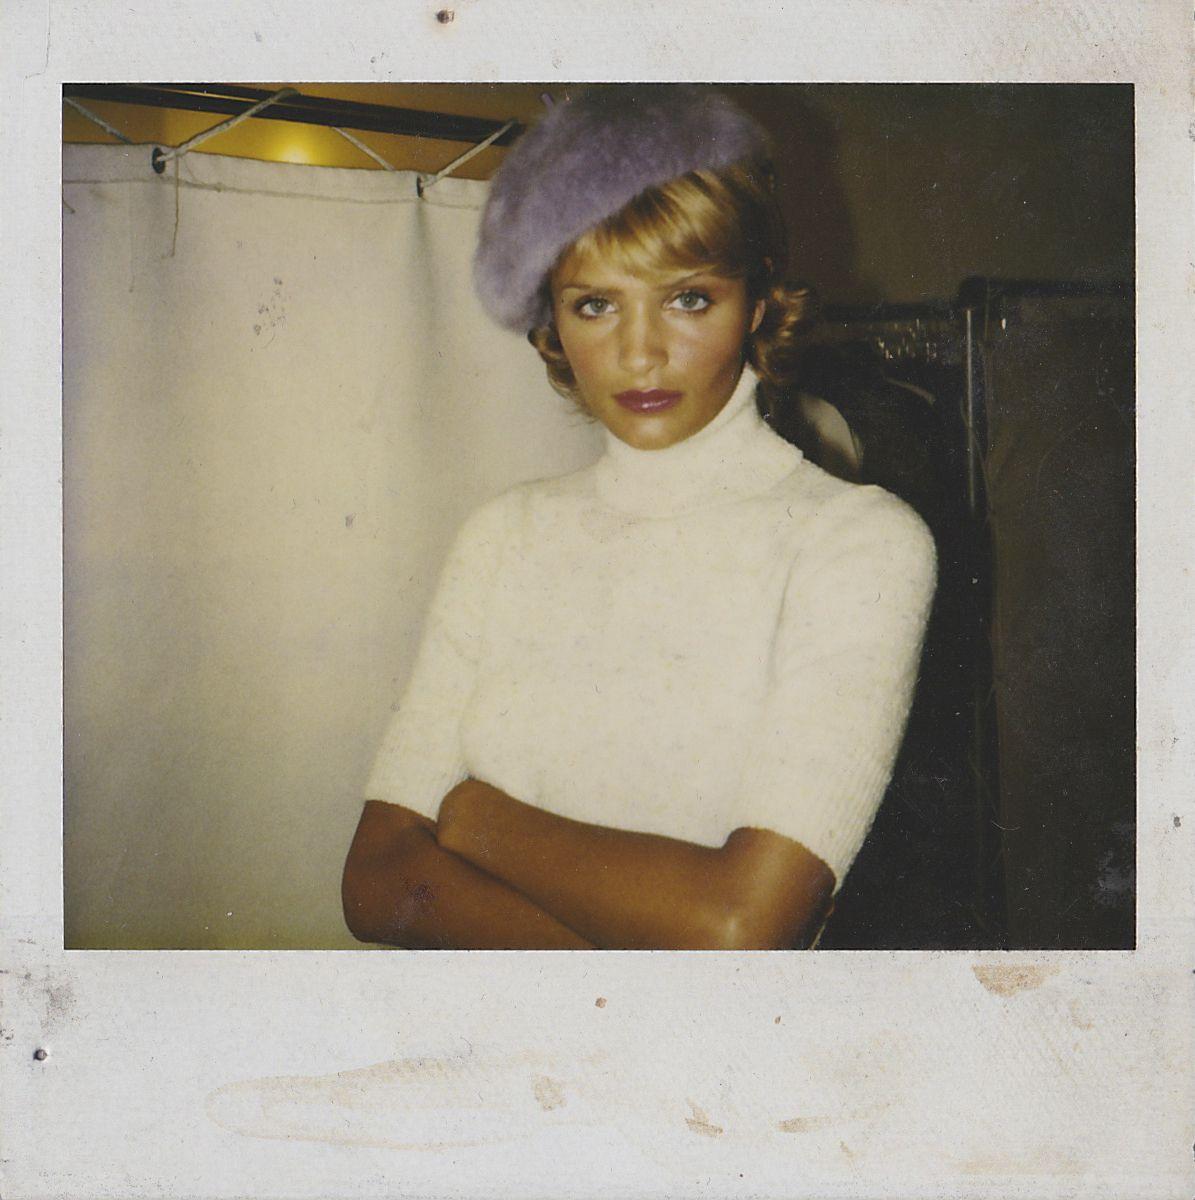 BLK #21: The Justin Henry scrapbook: Helena Christiansen on set shooting Mirabella magazine